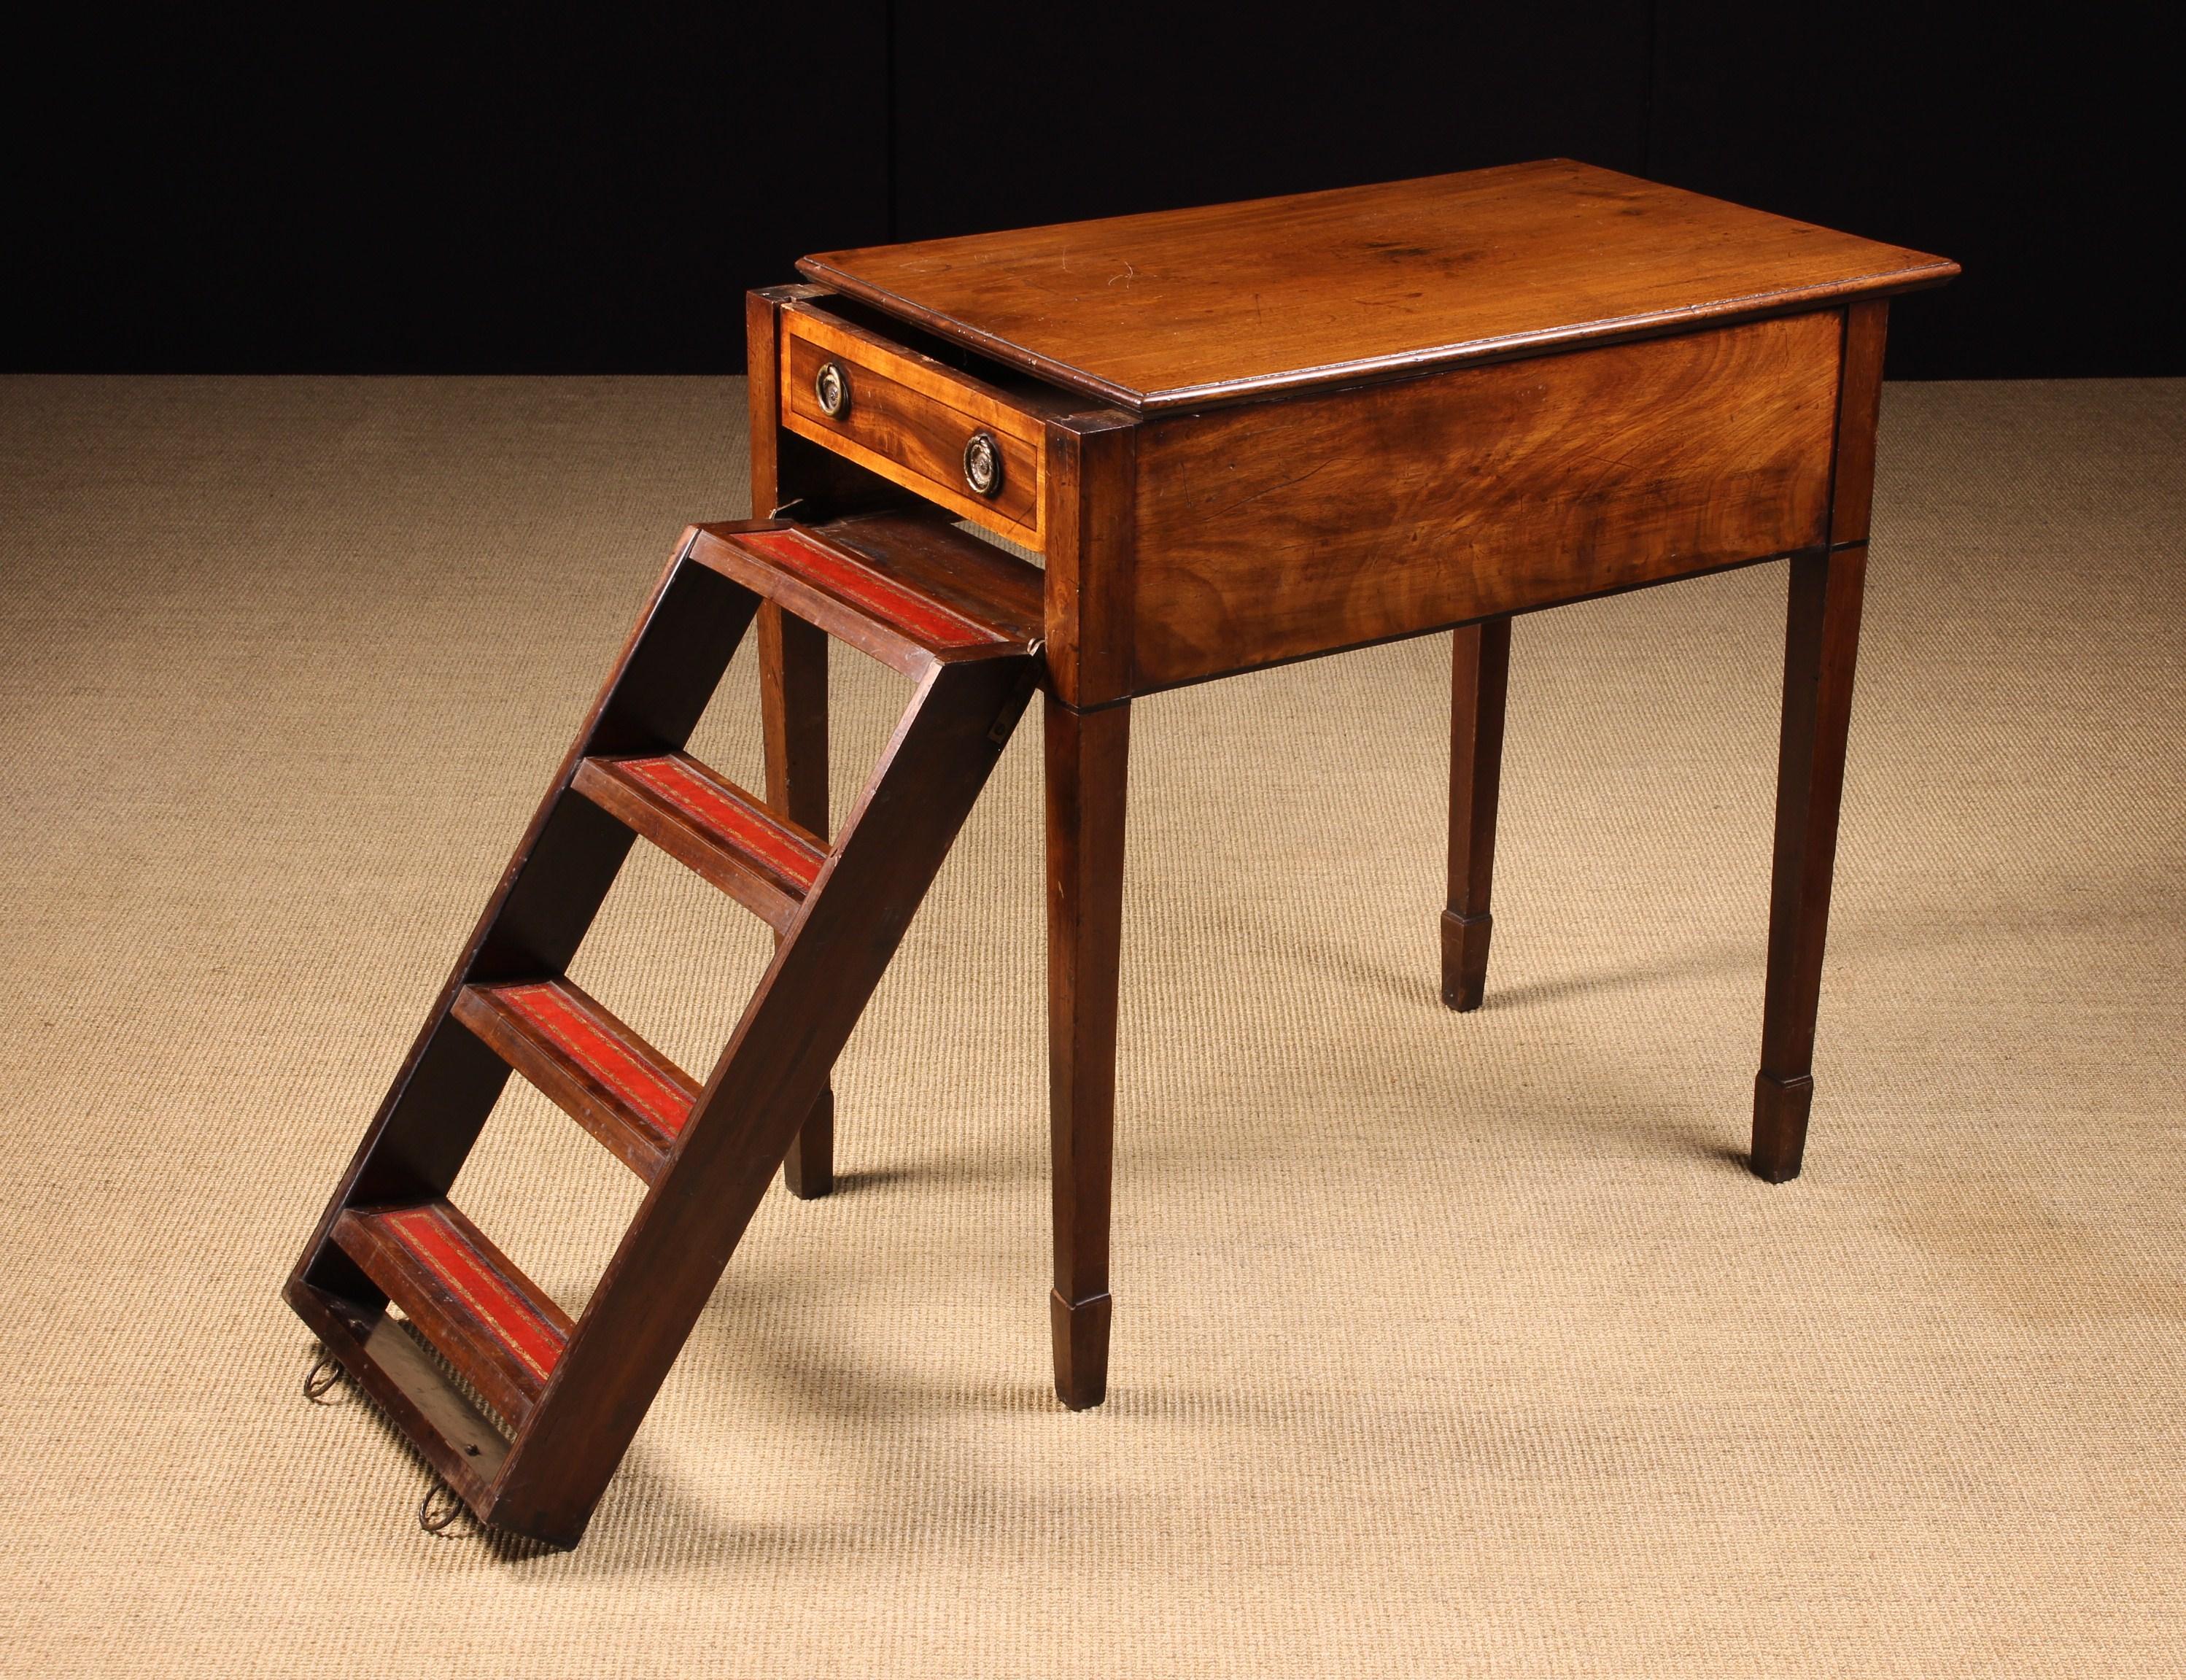 A Rare 19th Century Mahogany Metamorphic Side Table/Library Steps.